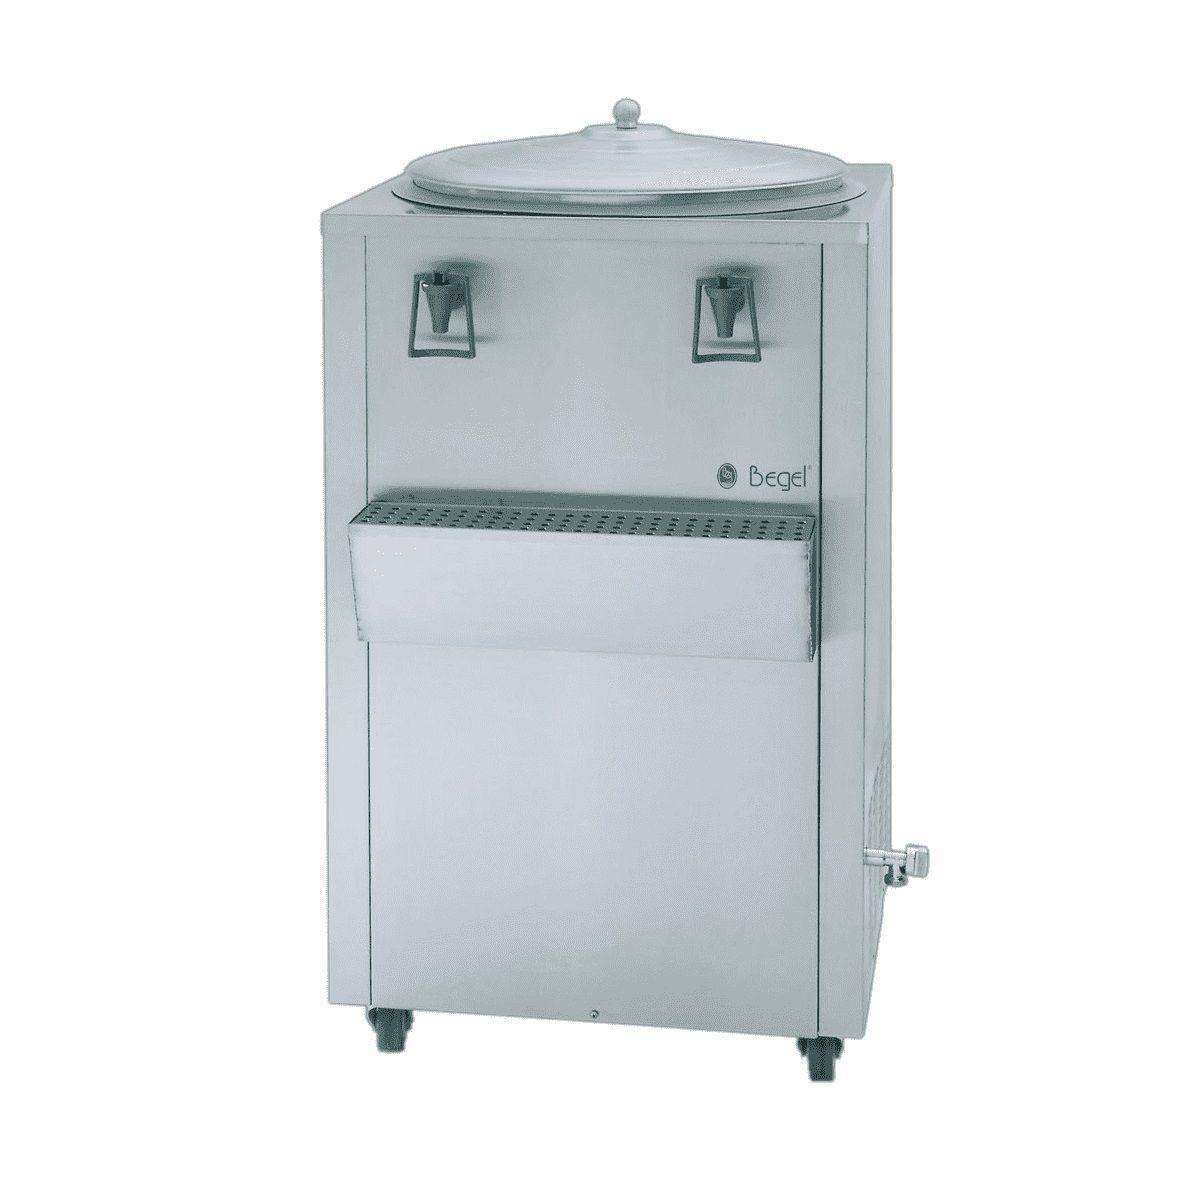 Refresqueira Industrial Begel 100 Litros - RFI100